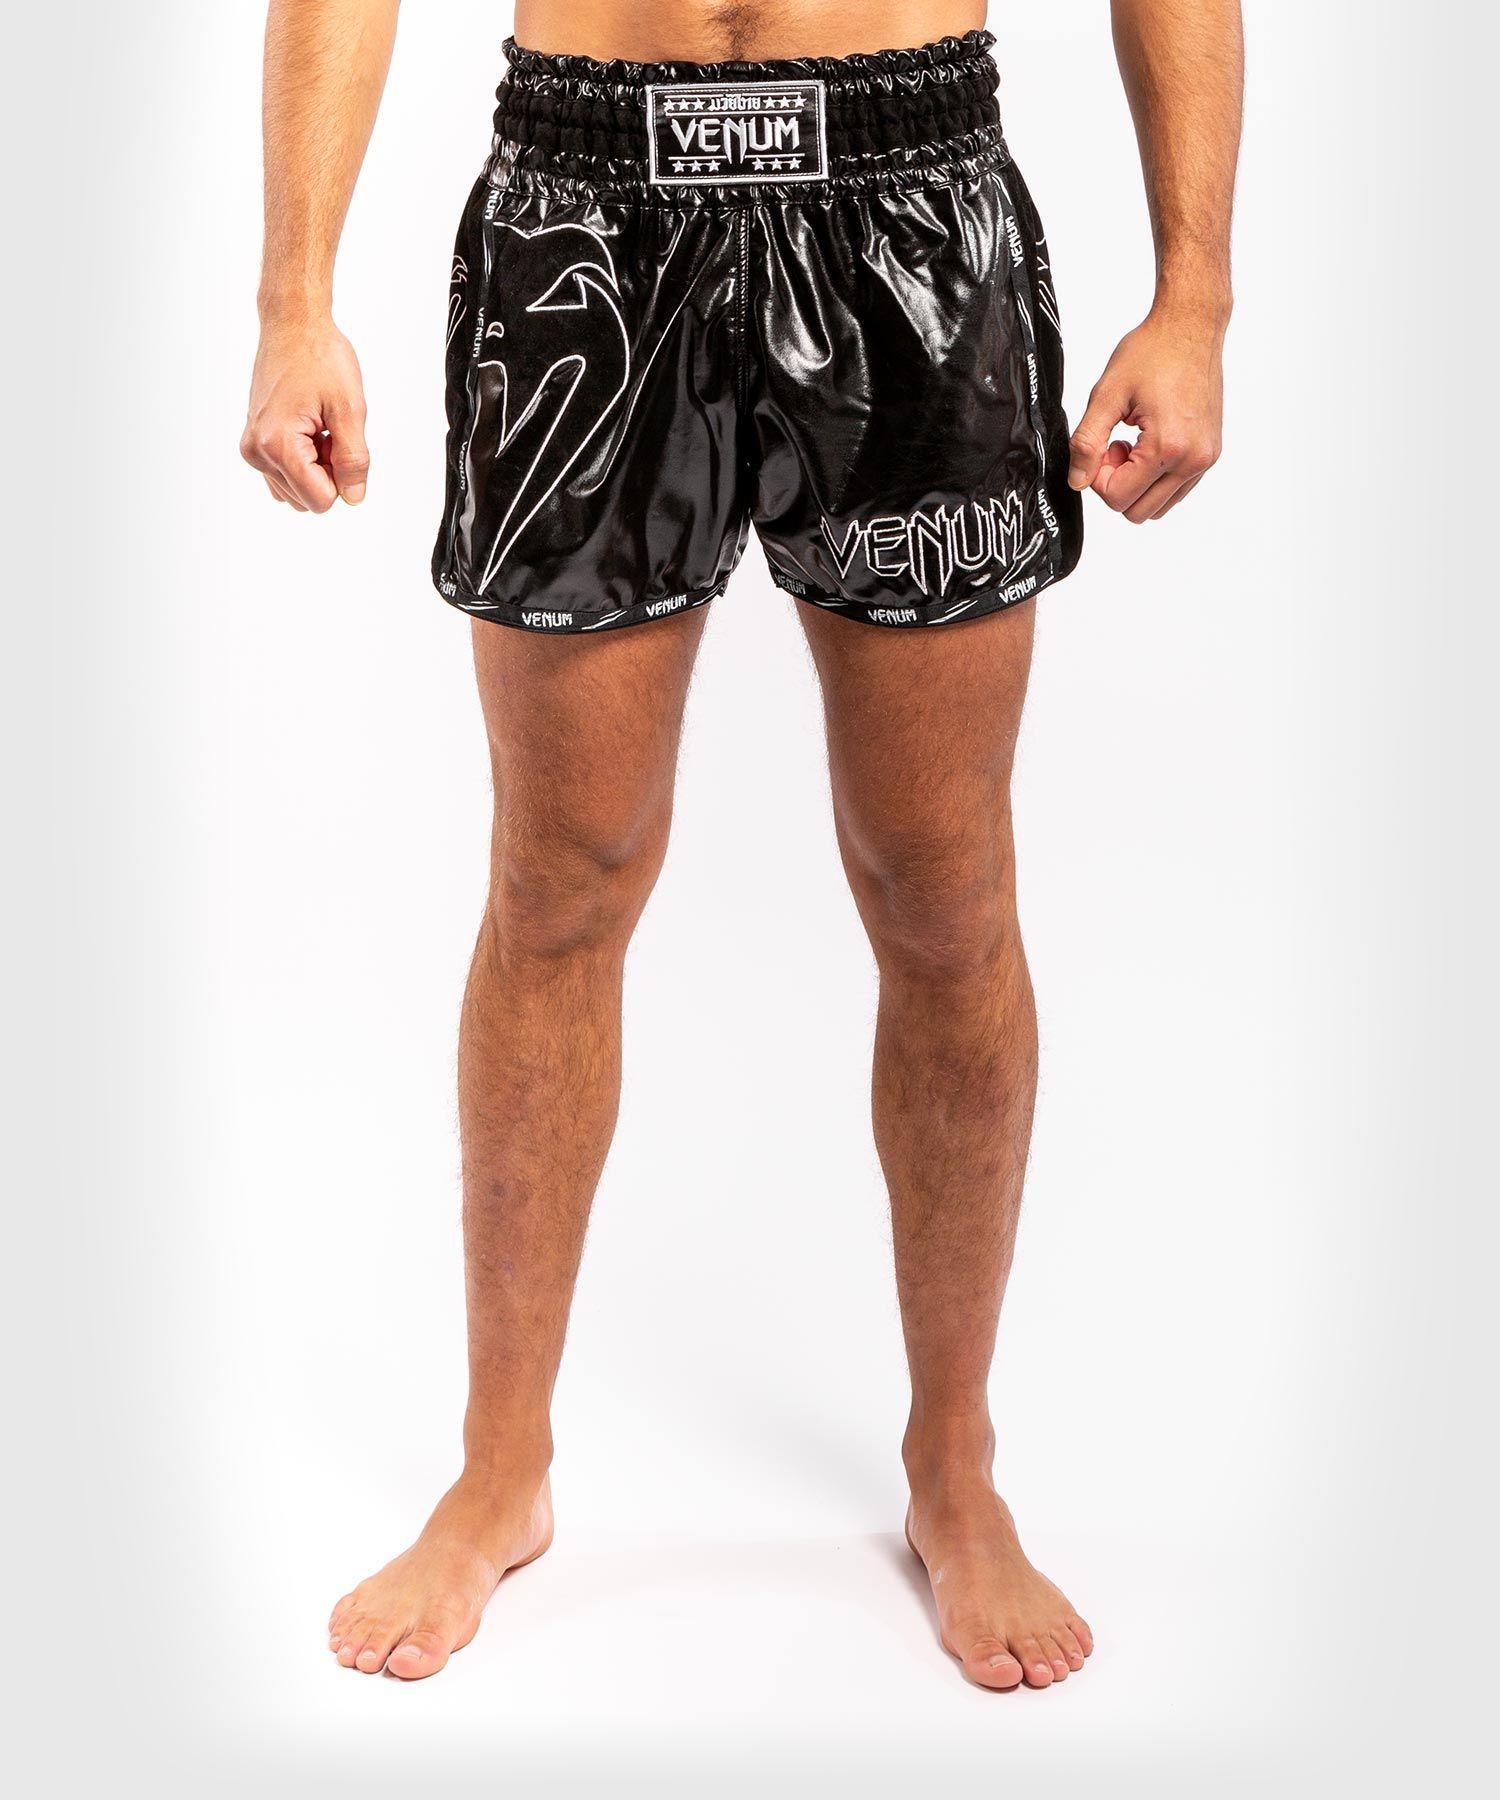 Venum Giant Infinite Muay Thai Shorts - Black/Black